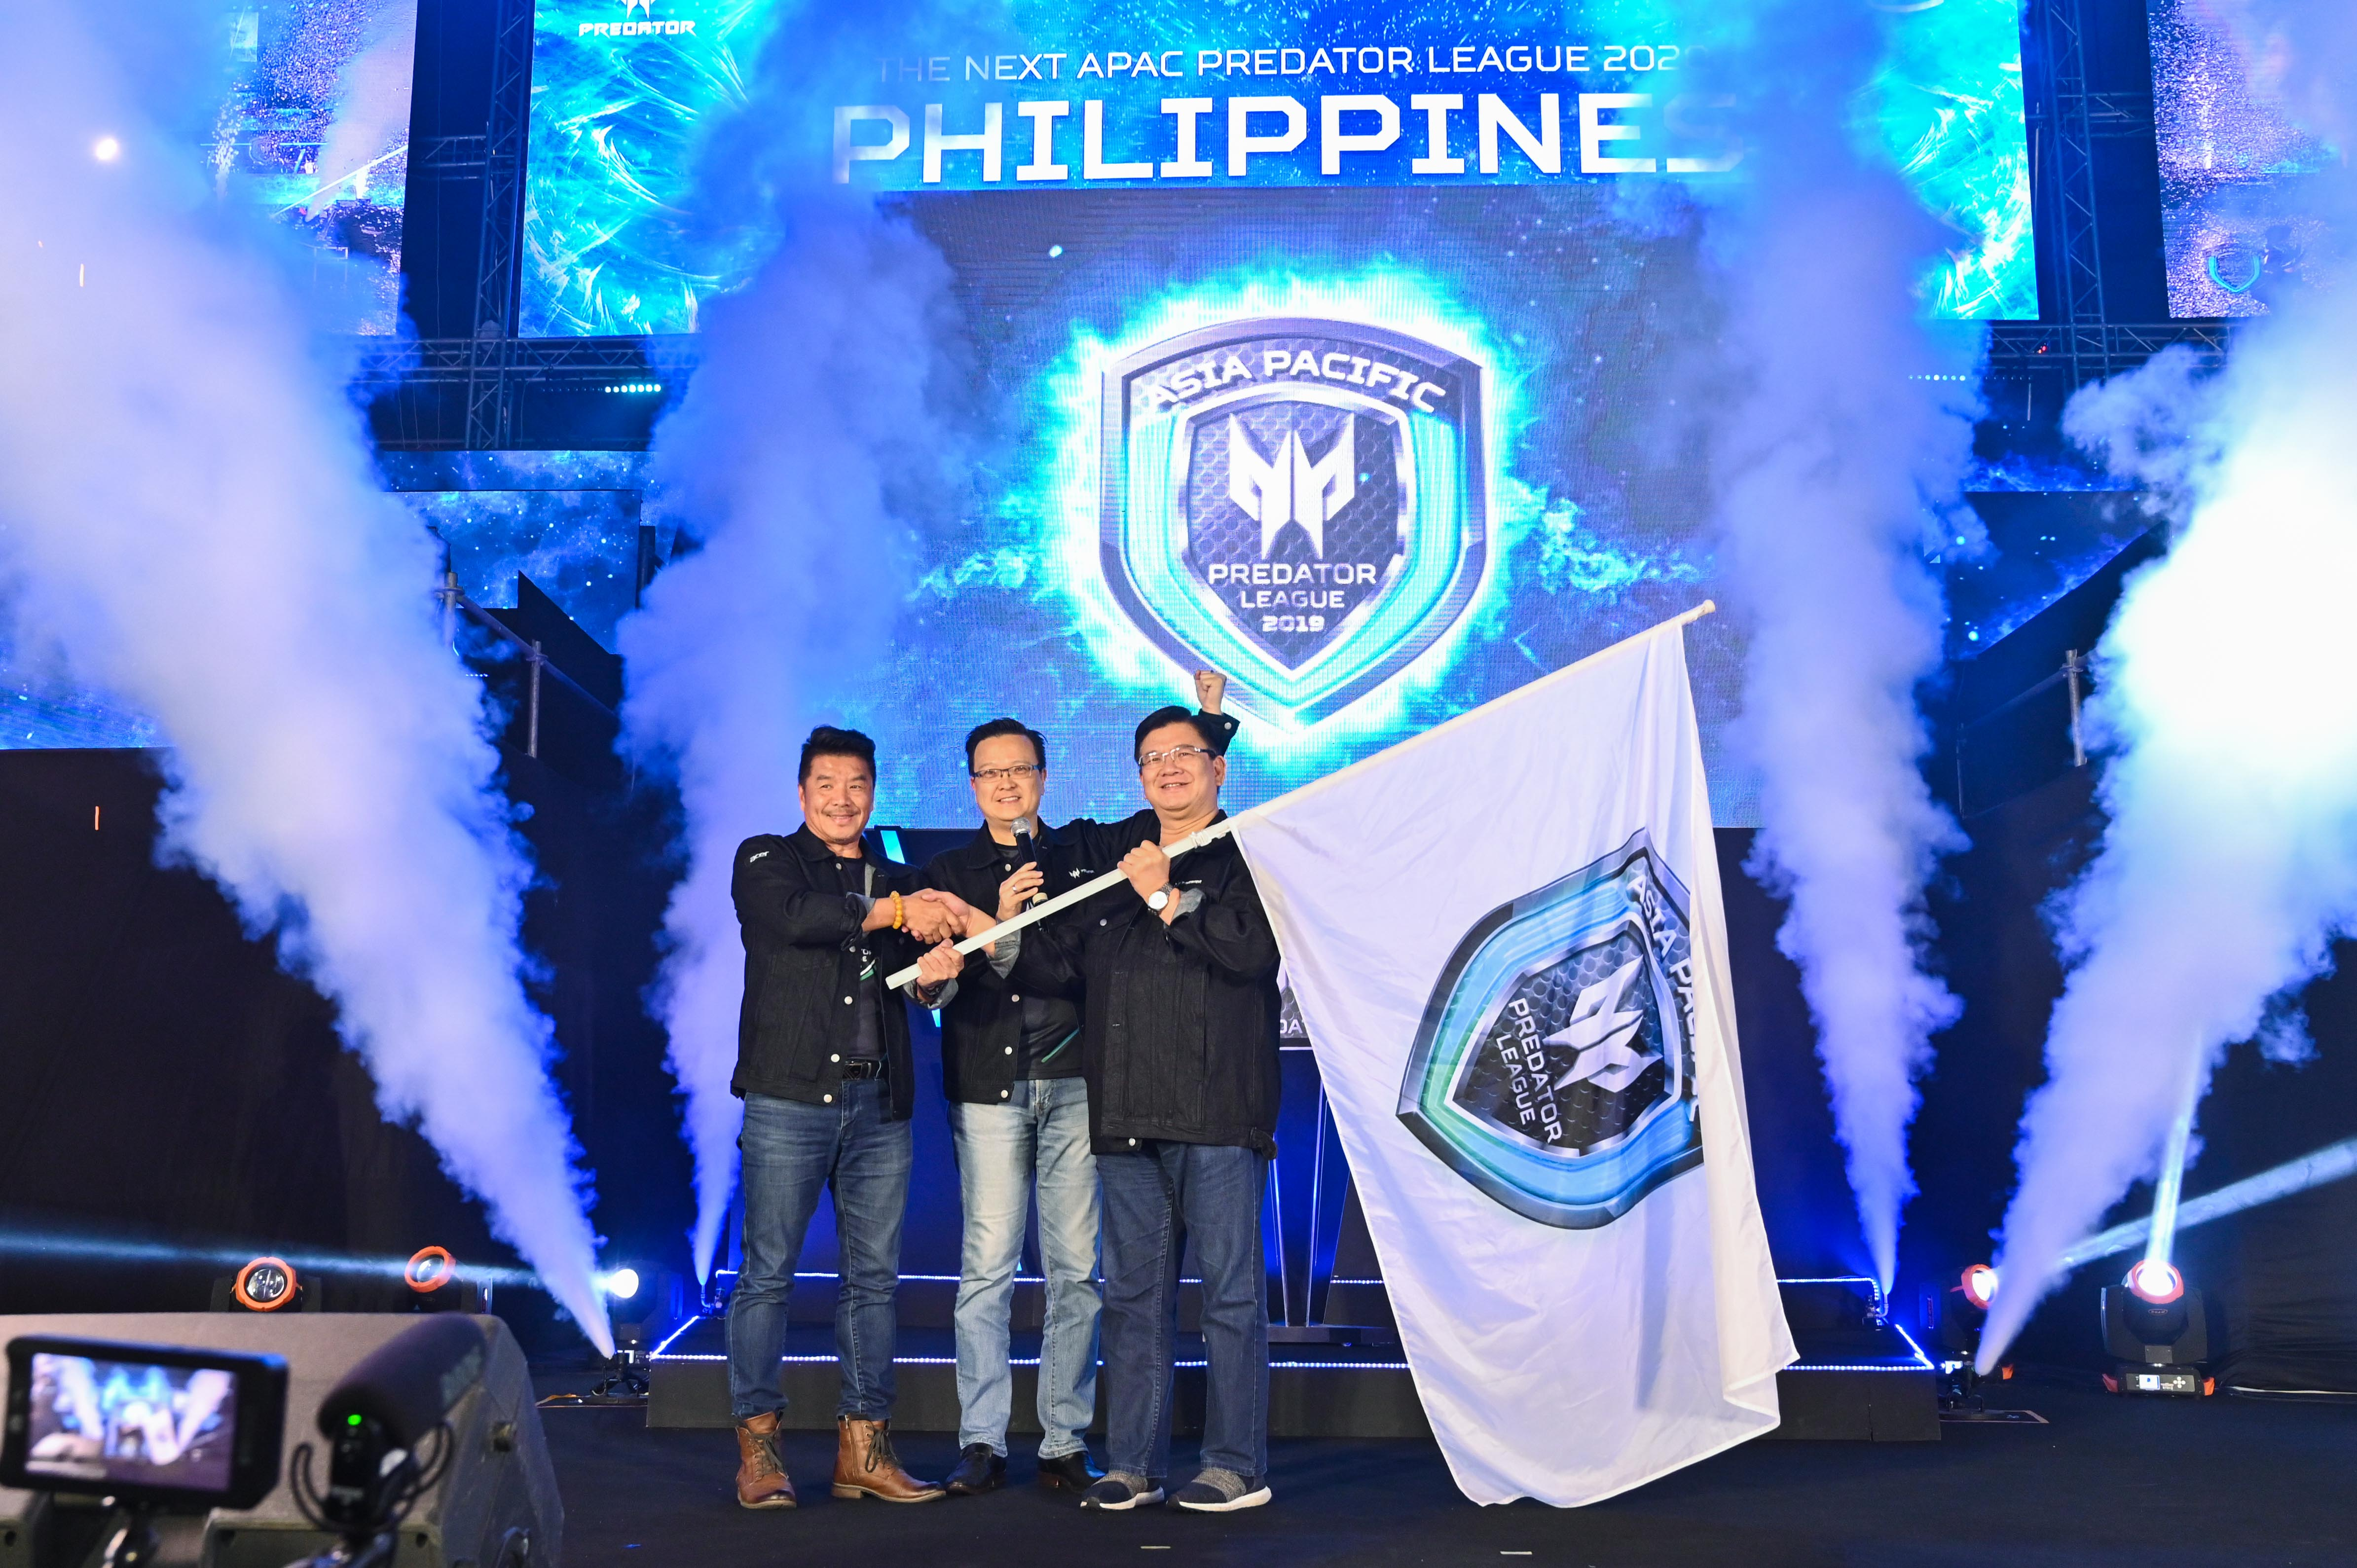 01 dsc 3689 17 02 19 บรรยากาศงาน Asia Pacific Predator League 2019 สุดยอดขุนพลทีมอีสปอร์ตเข้าร่วมการแข่งขันรอบแกรนด์ไฟนอล